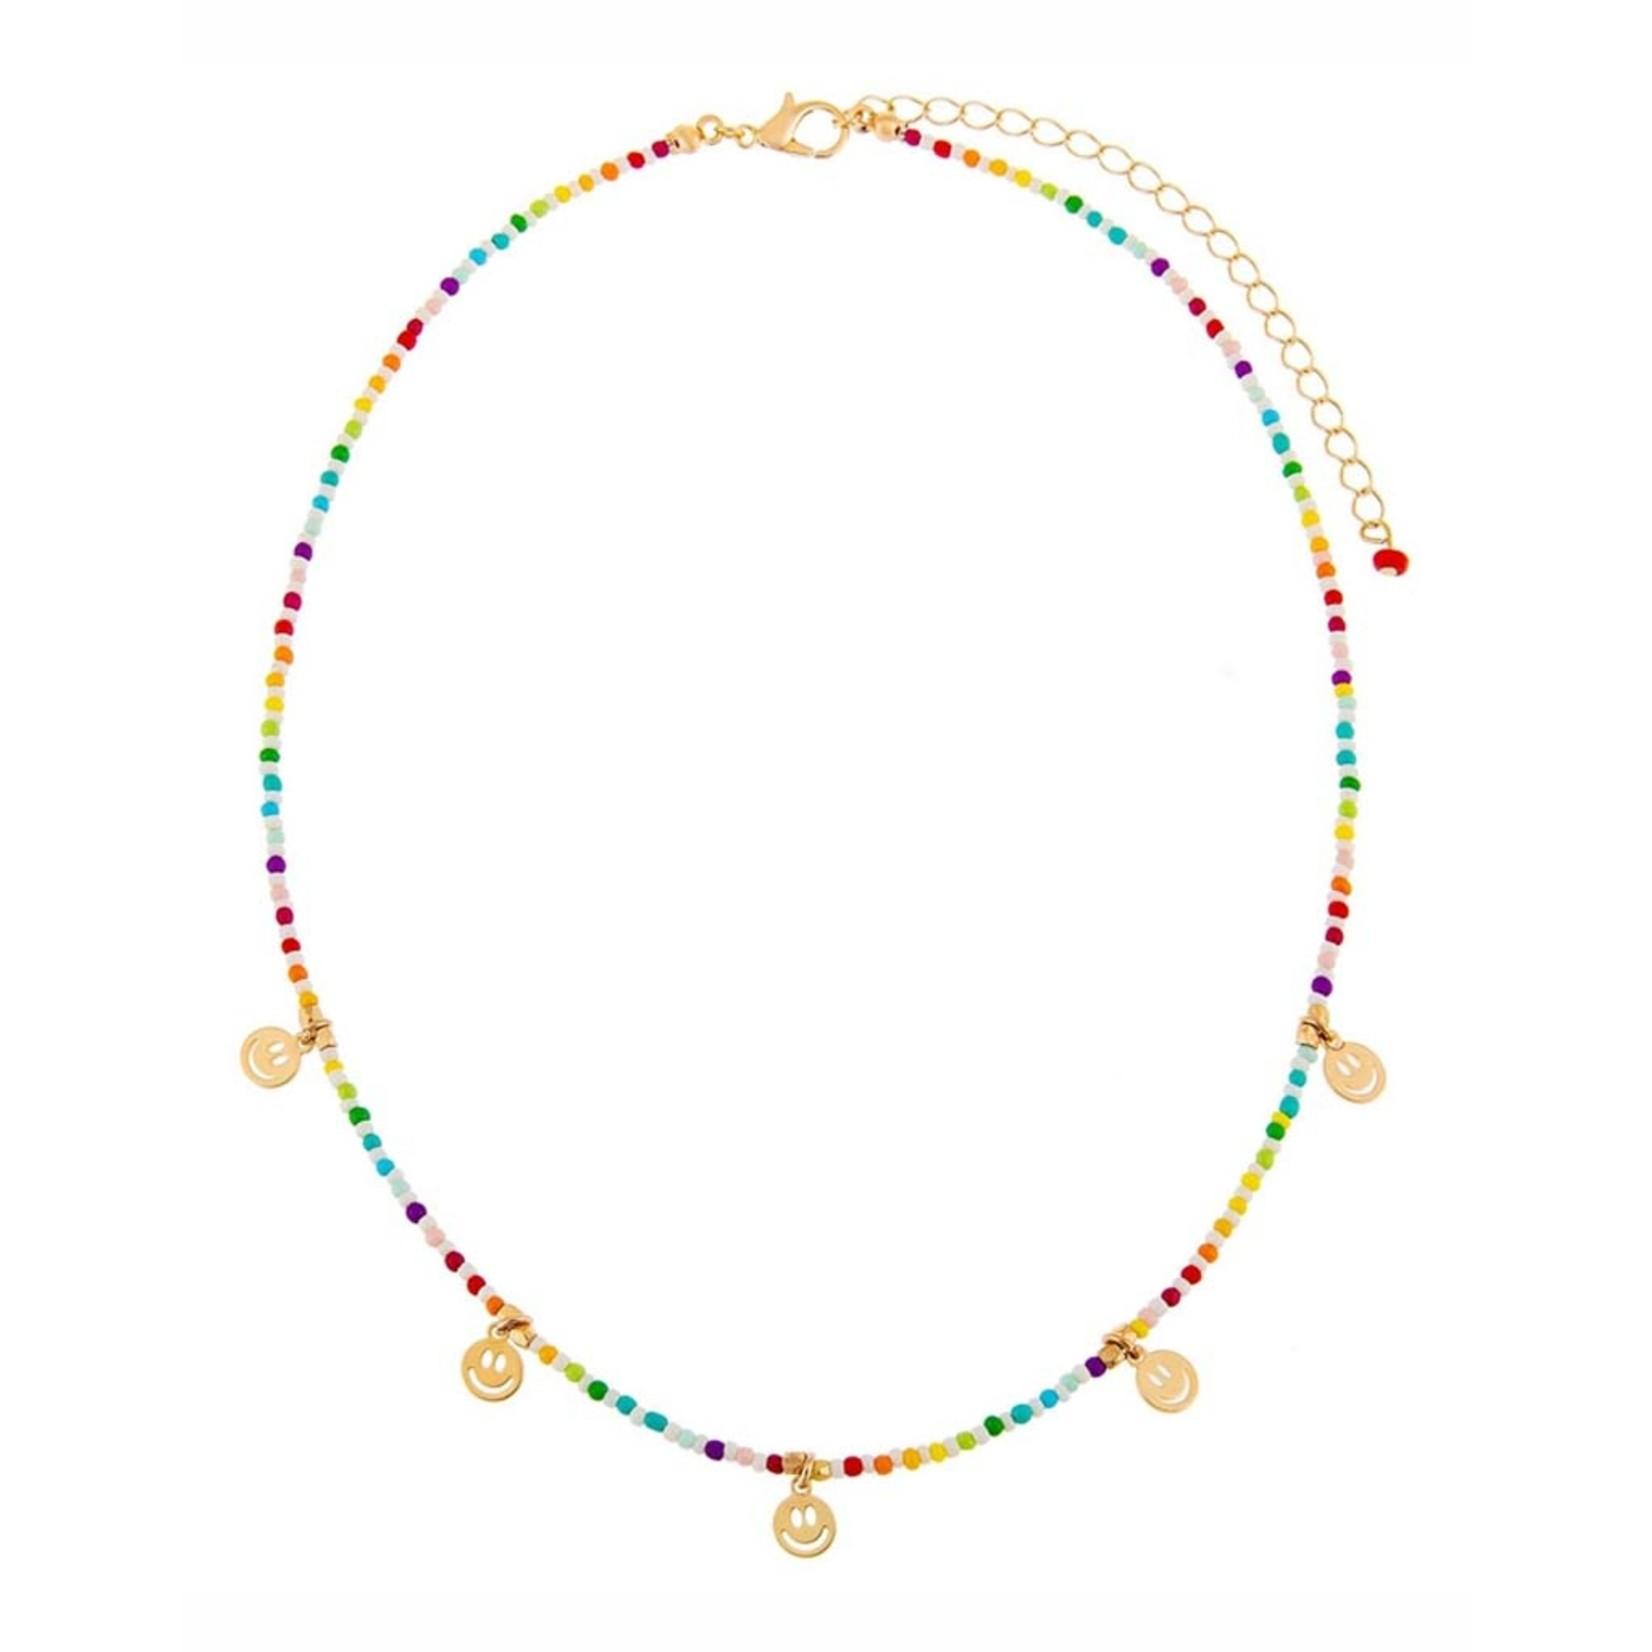 Adinas Rainbow Smiley Face Beaded Necklace